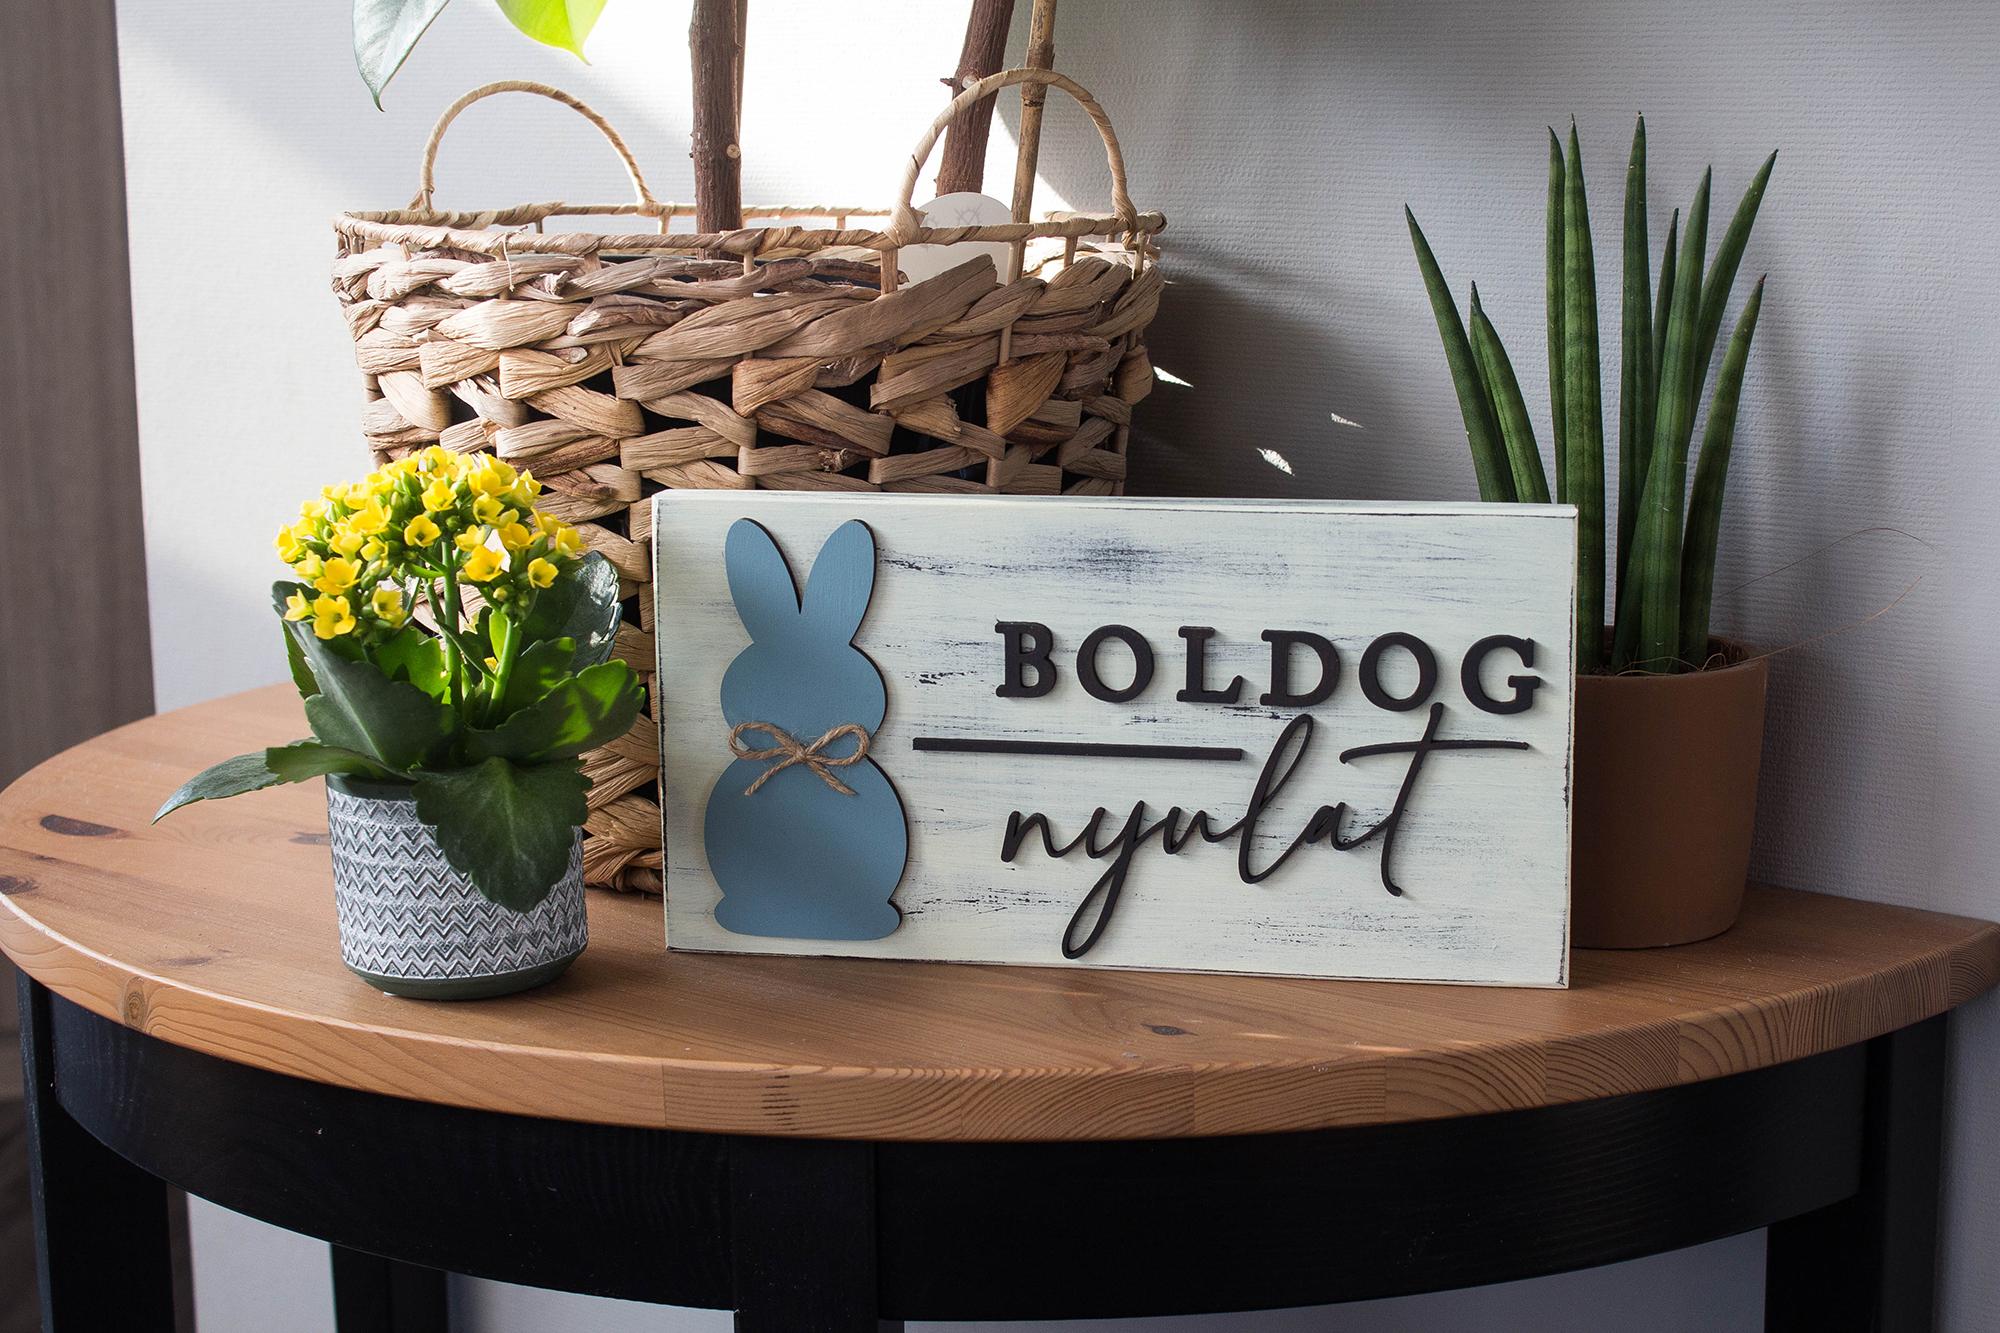 Húsvéti üdvözlőtábla